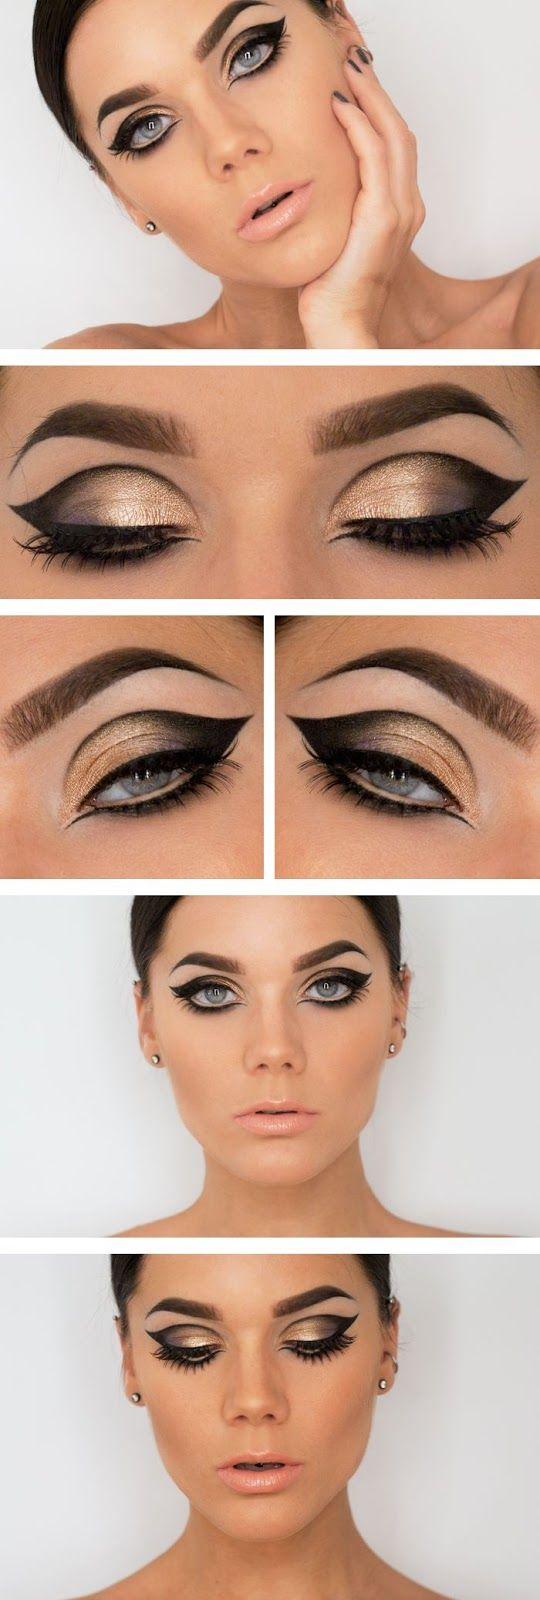 creatividad...: maquillaje